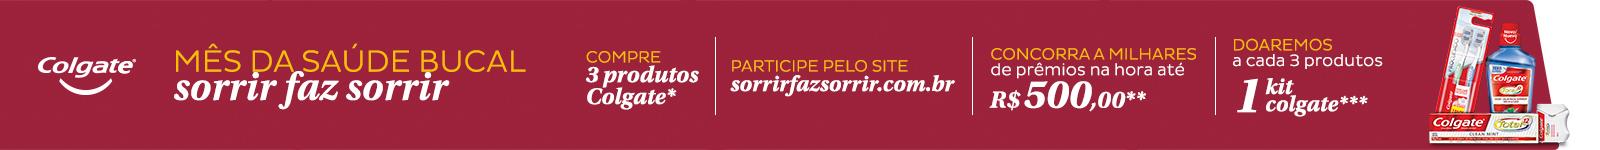 wysiwyg/Banner_Parceiros_18/Banner_Setembro_18/1600x150_drogaraia_9.jpg